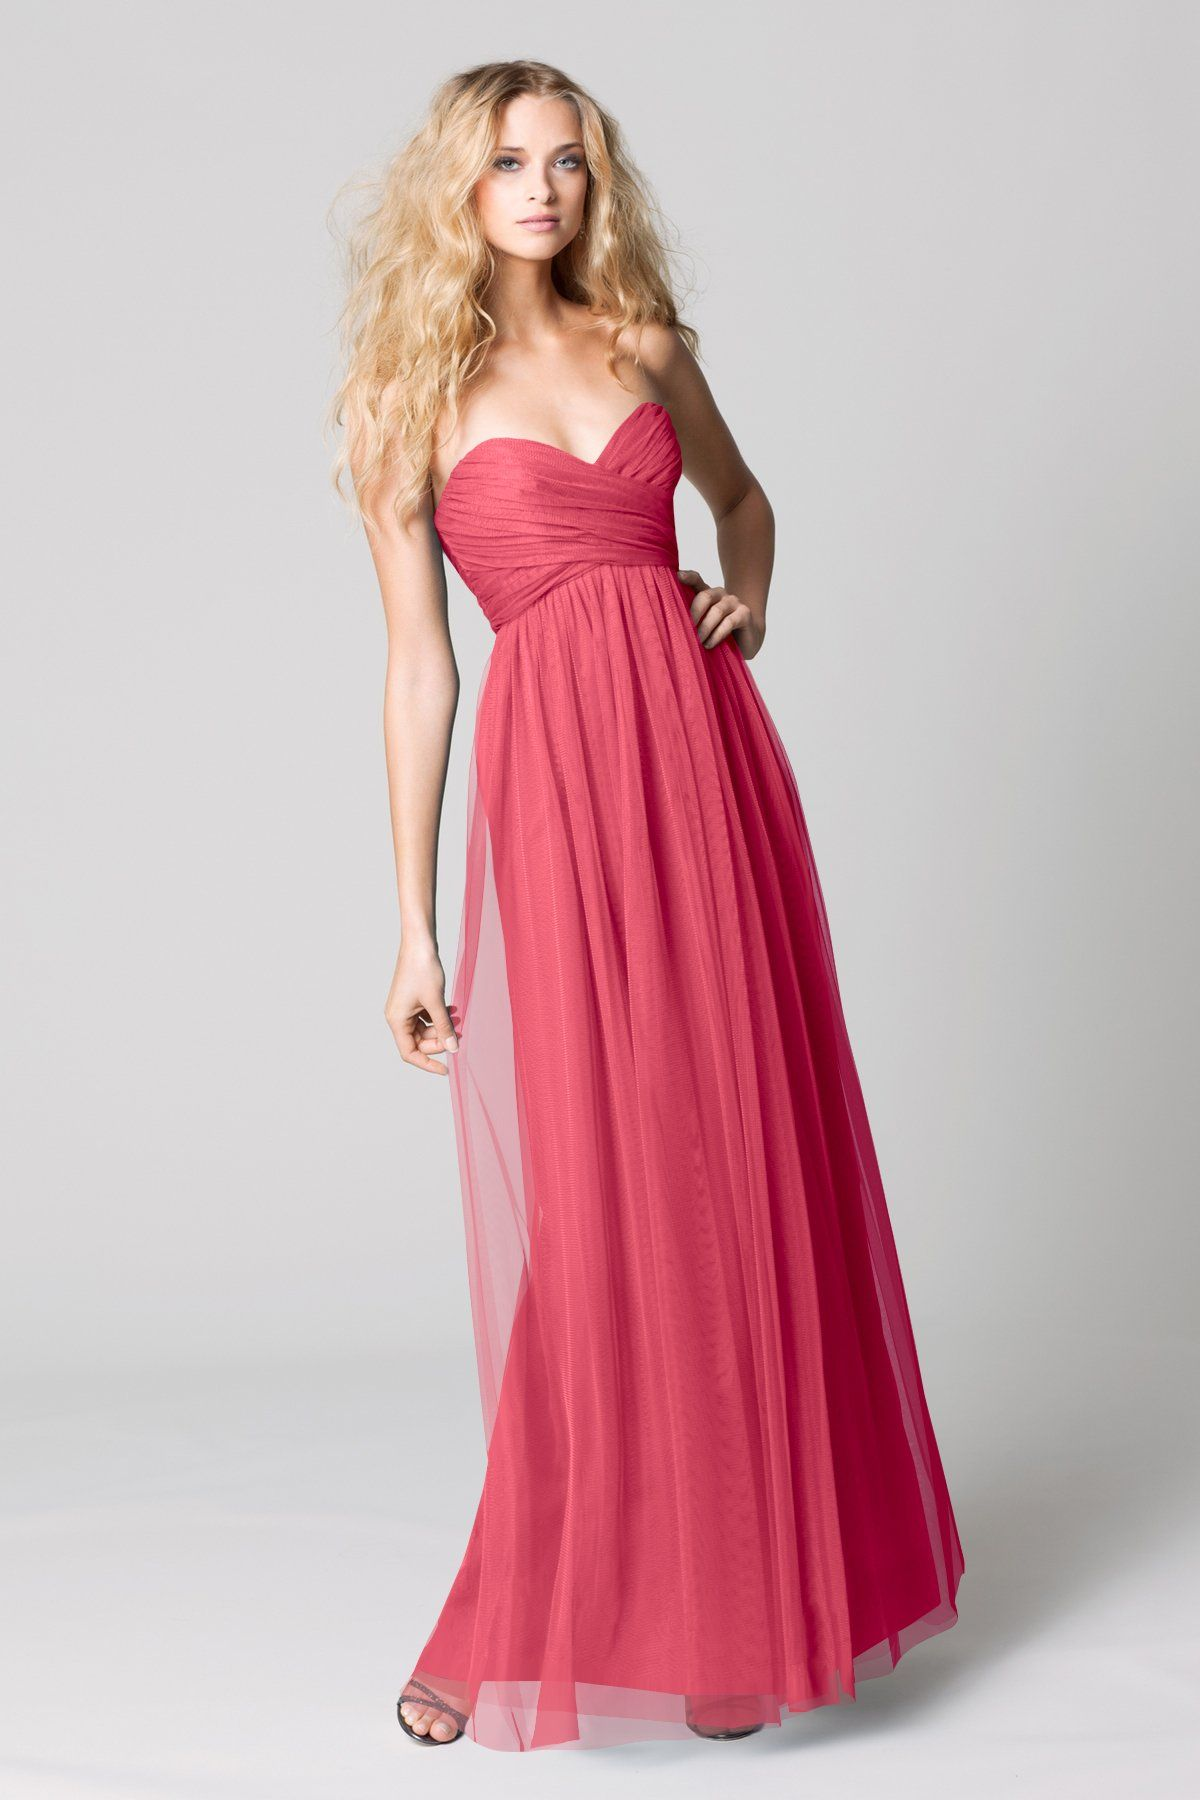 Wtoo 337 Bridesmaid Dress watermelon bobbinet   Fashionn   Pinterest ...